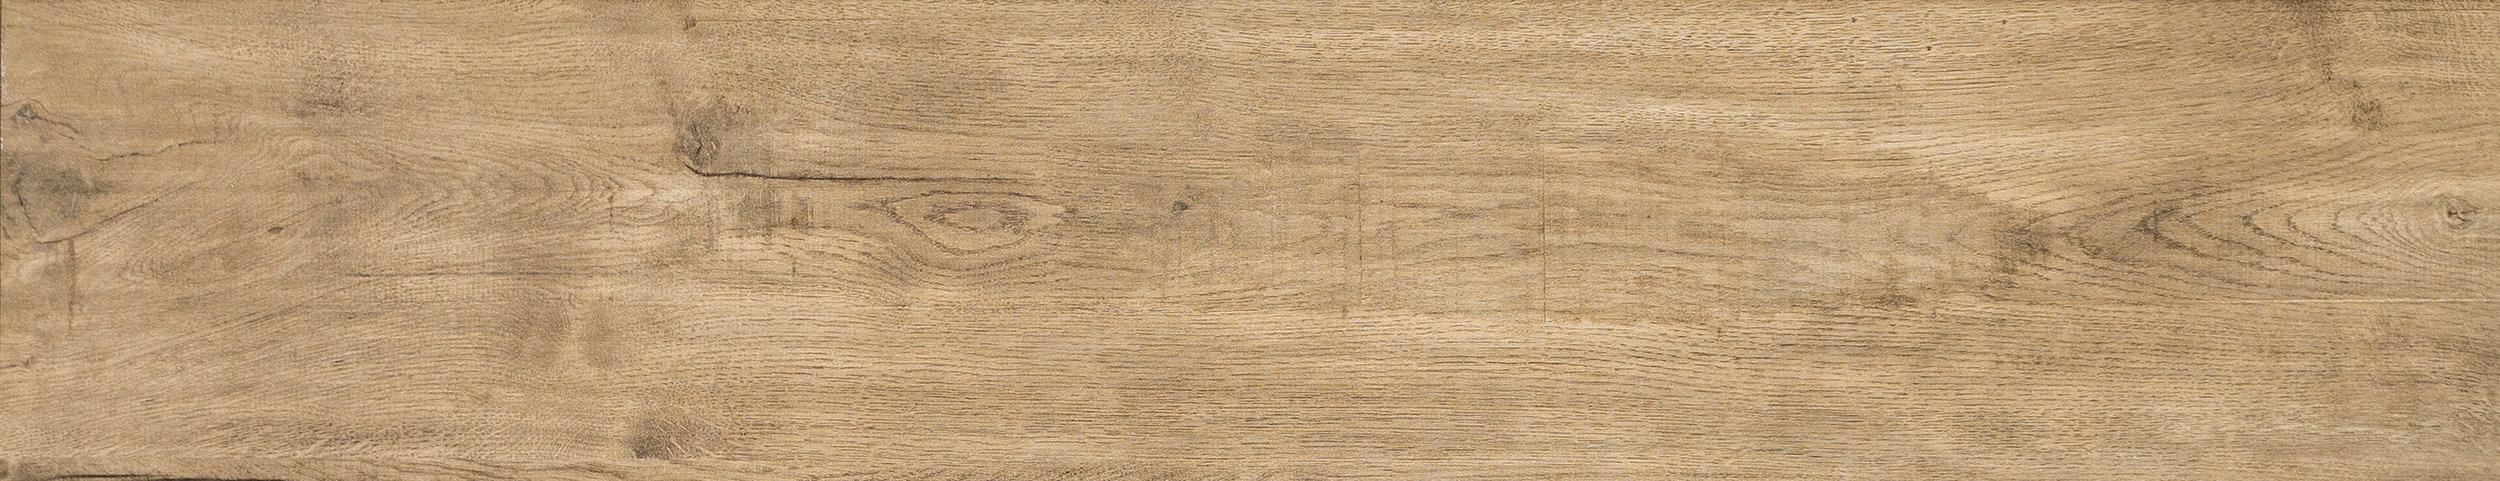 "log wood 6.5"" x 39.25"" beige"